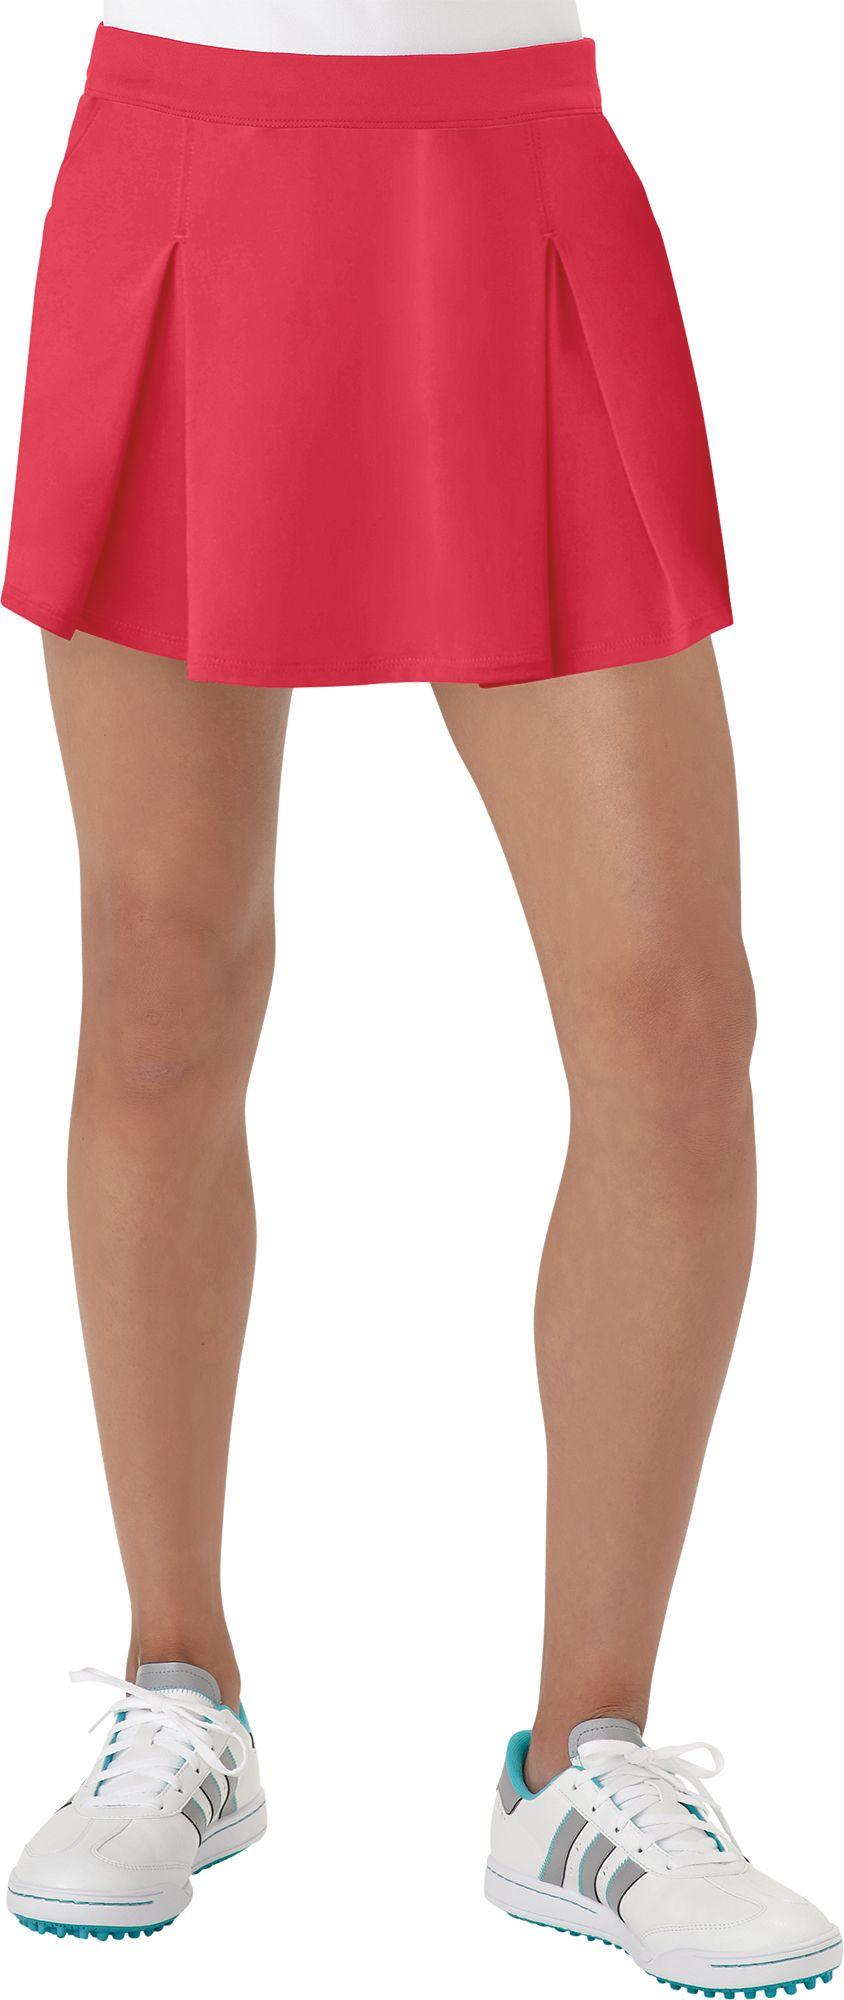 adidas Girls Fashion Pleated Golf Skort DICKS Sporting Goods